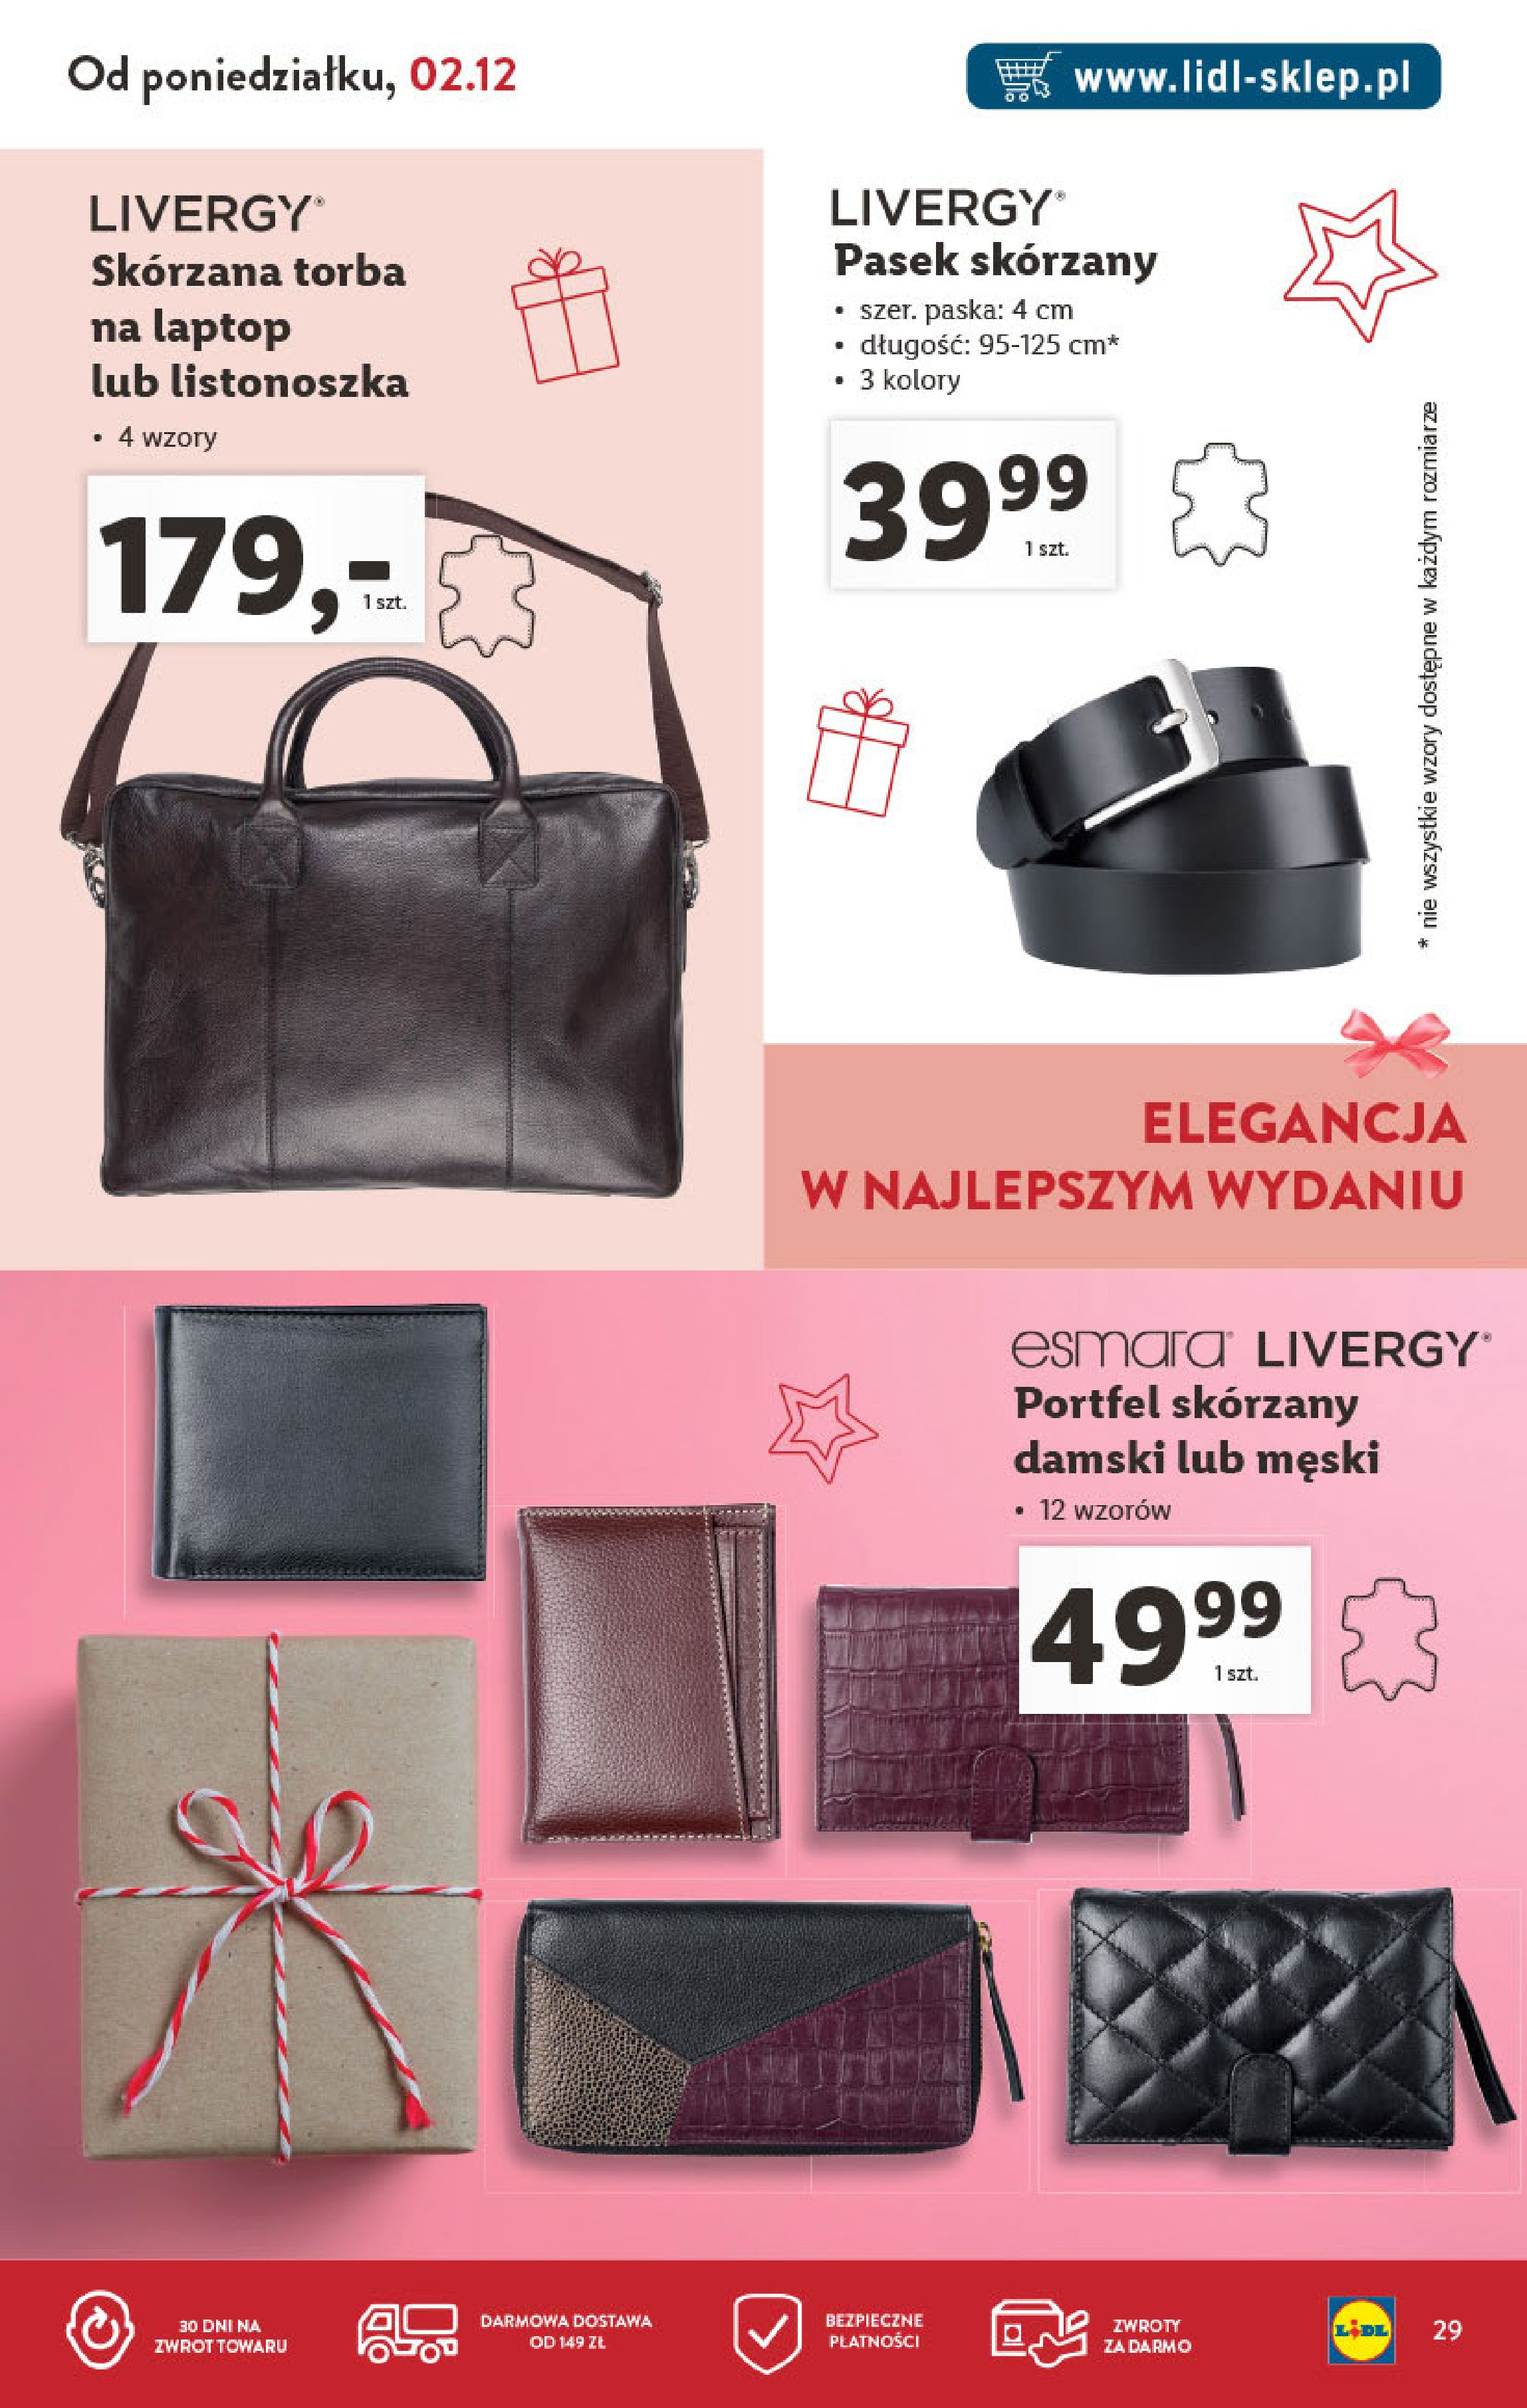 Gazetka Lidl - Katalog Online-13.10.2019-02.12.2019-page-29